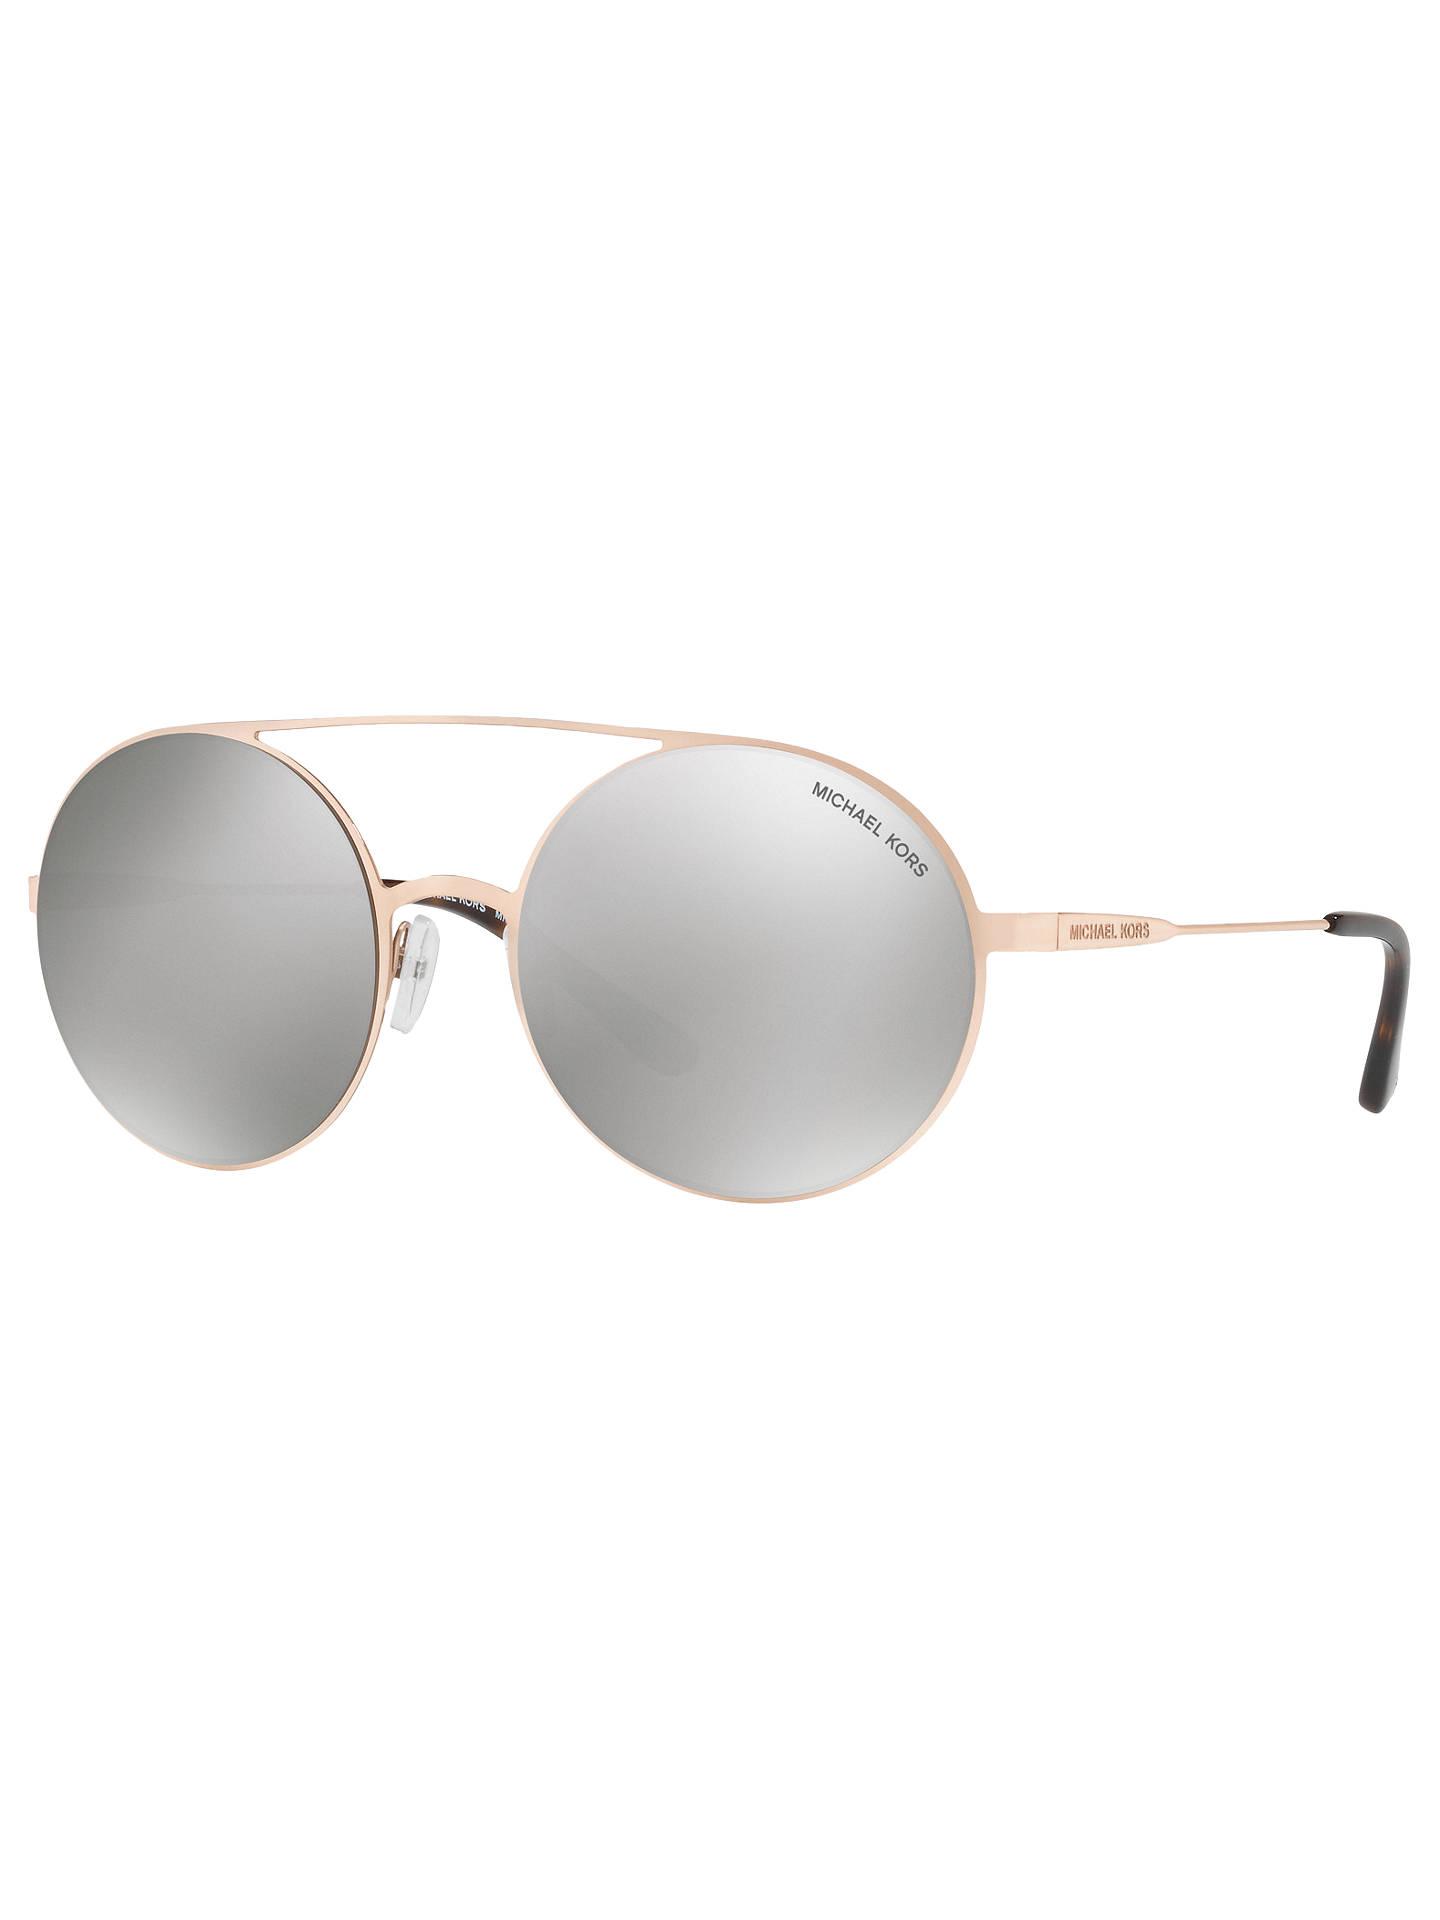 6558651eb80e Buy Michael Kors MK1027 Round Sunglasses, Rose Gold/Mirror Silver Online at  johnlewis.